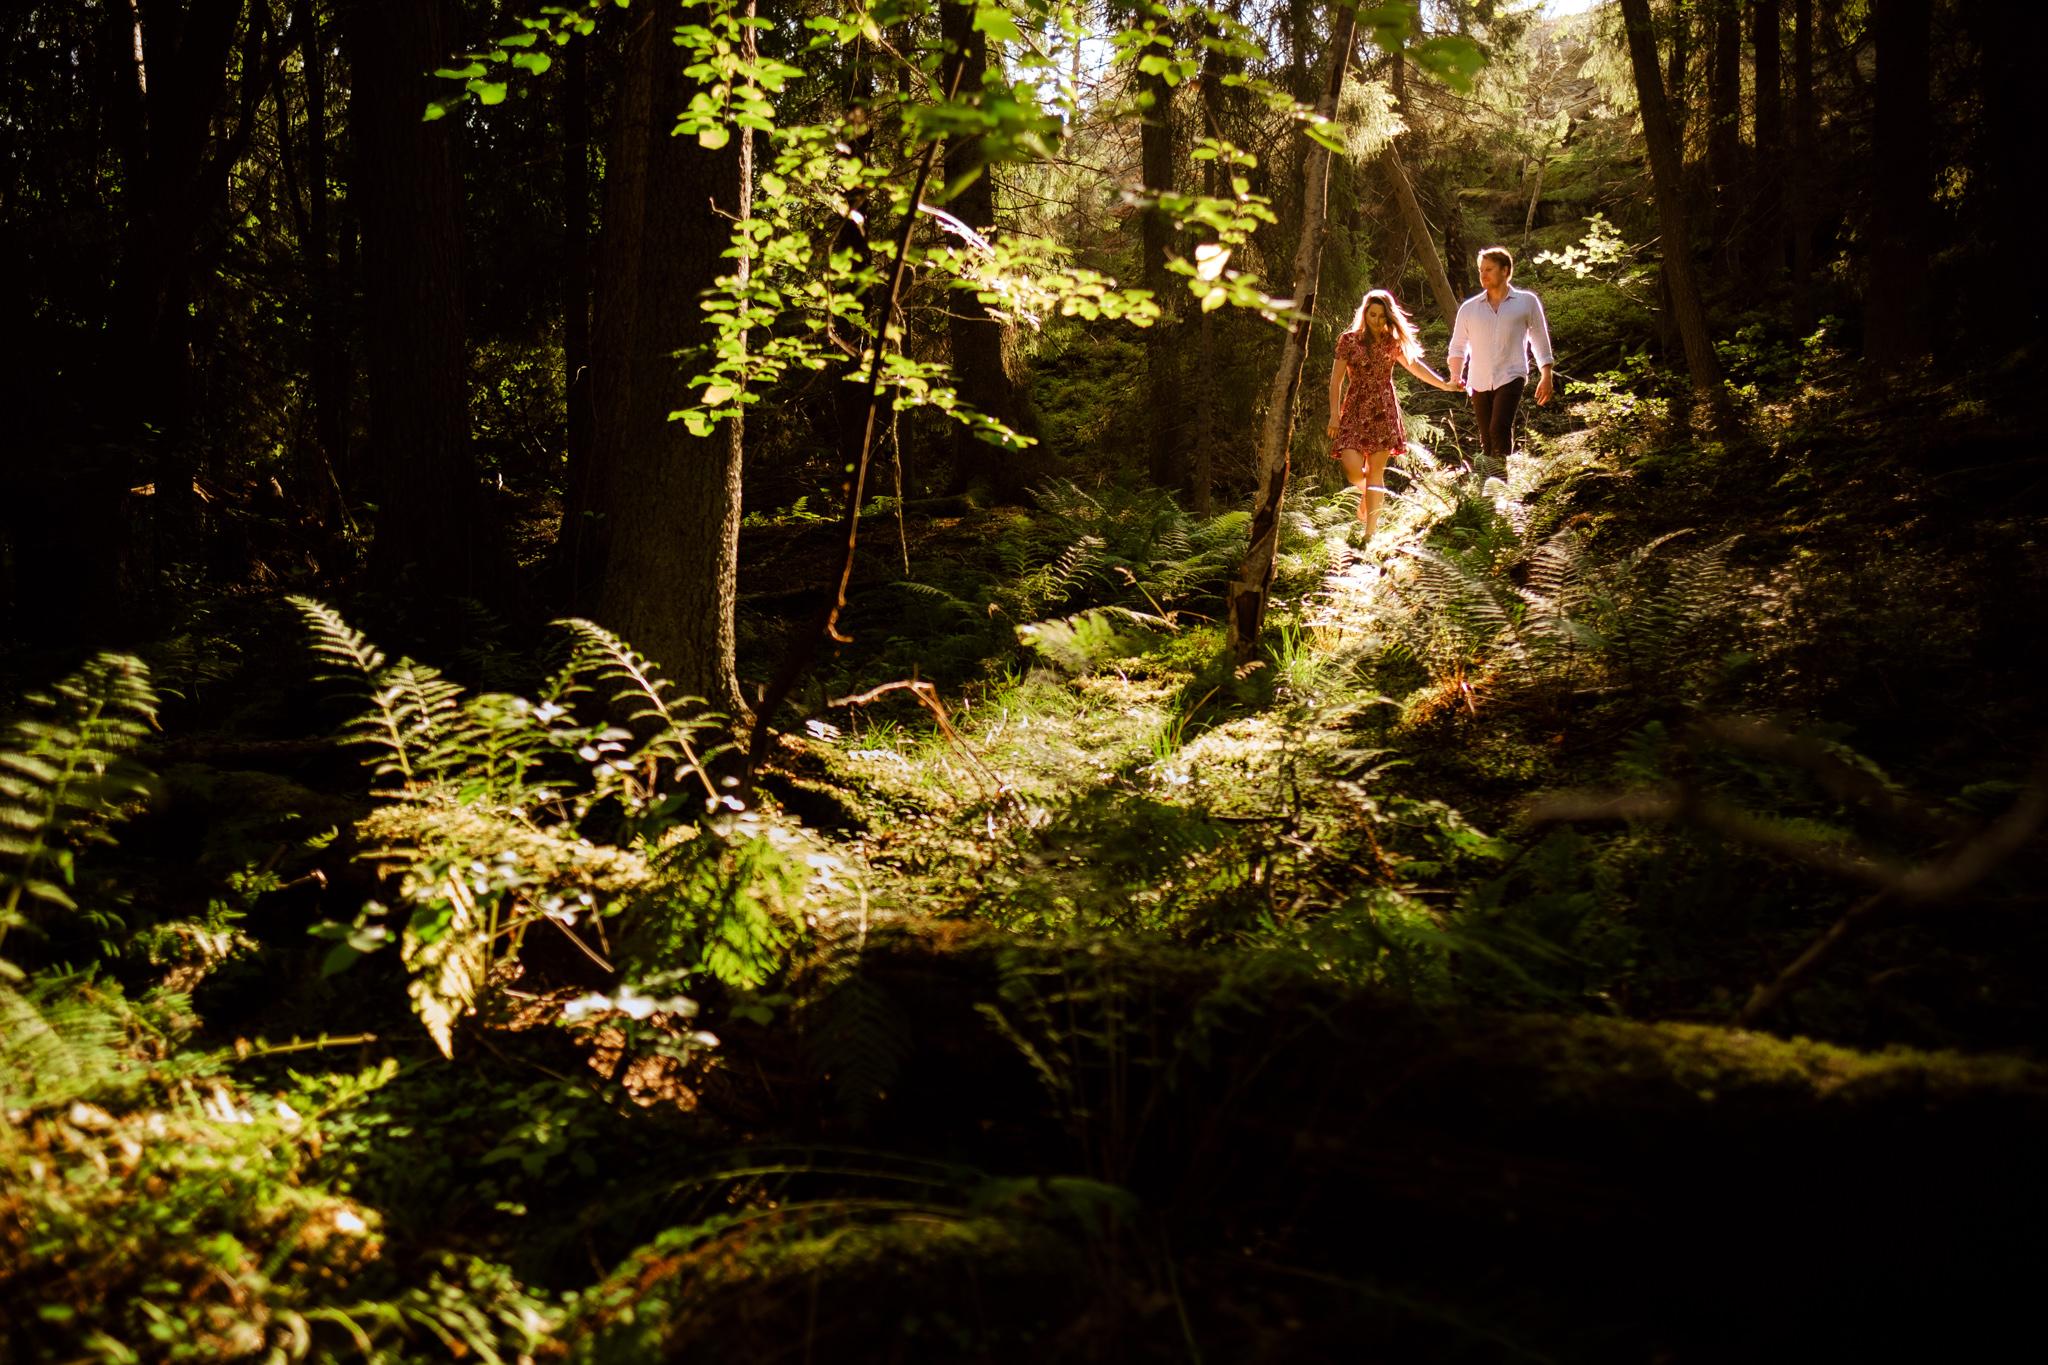 stockholm-wedding-photographer-63-de-72.jpg